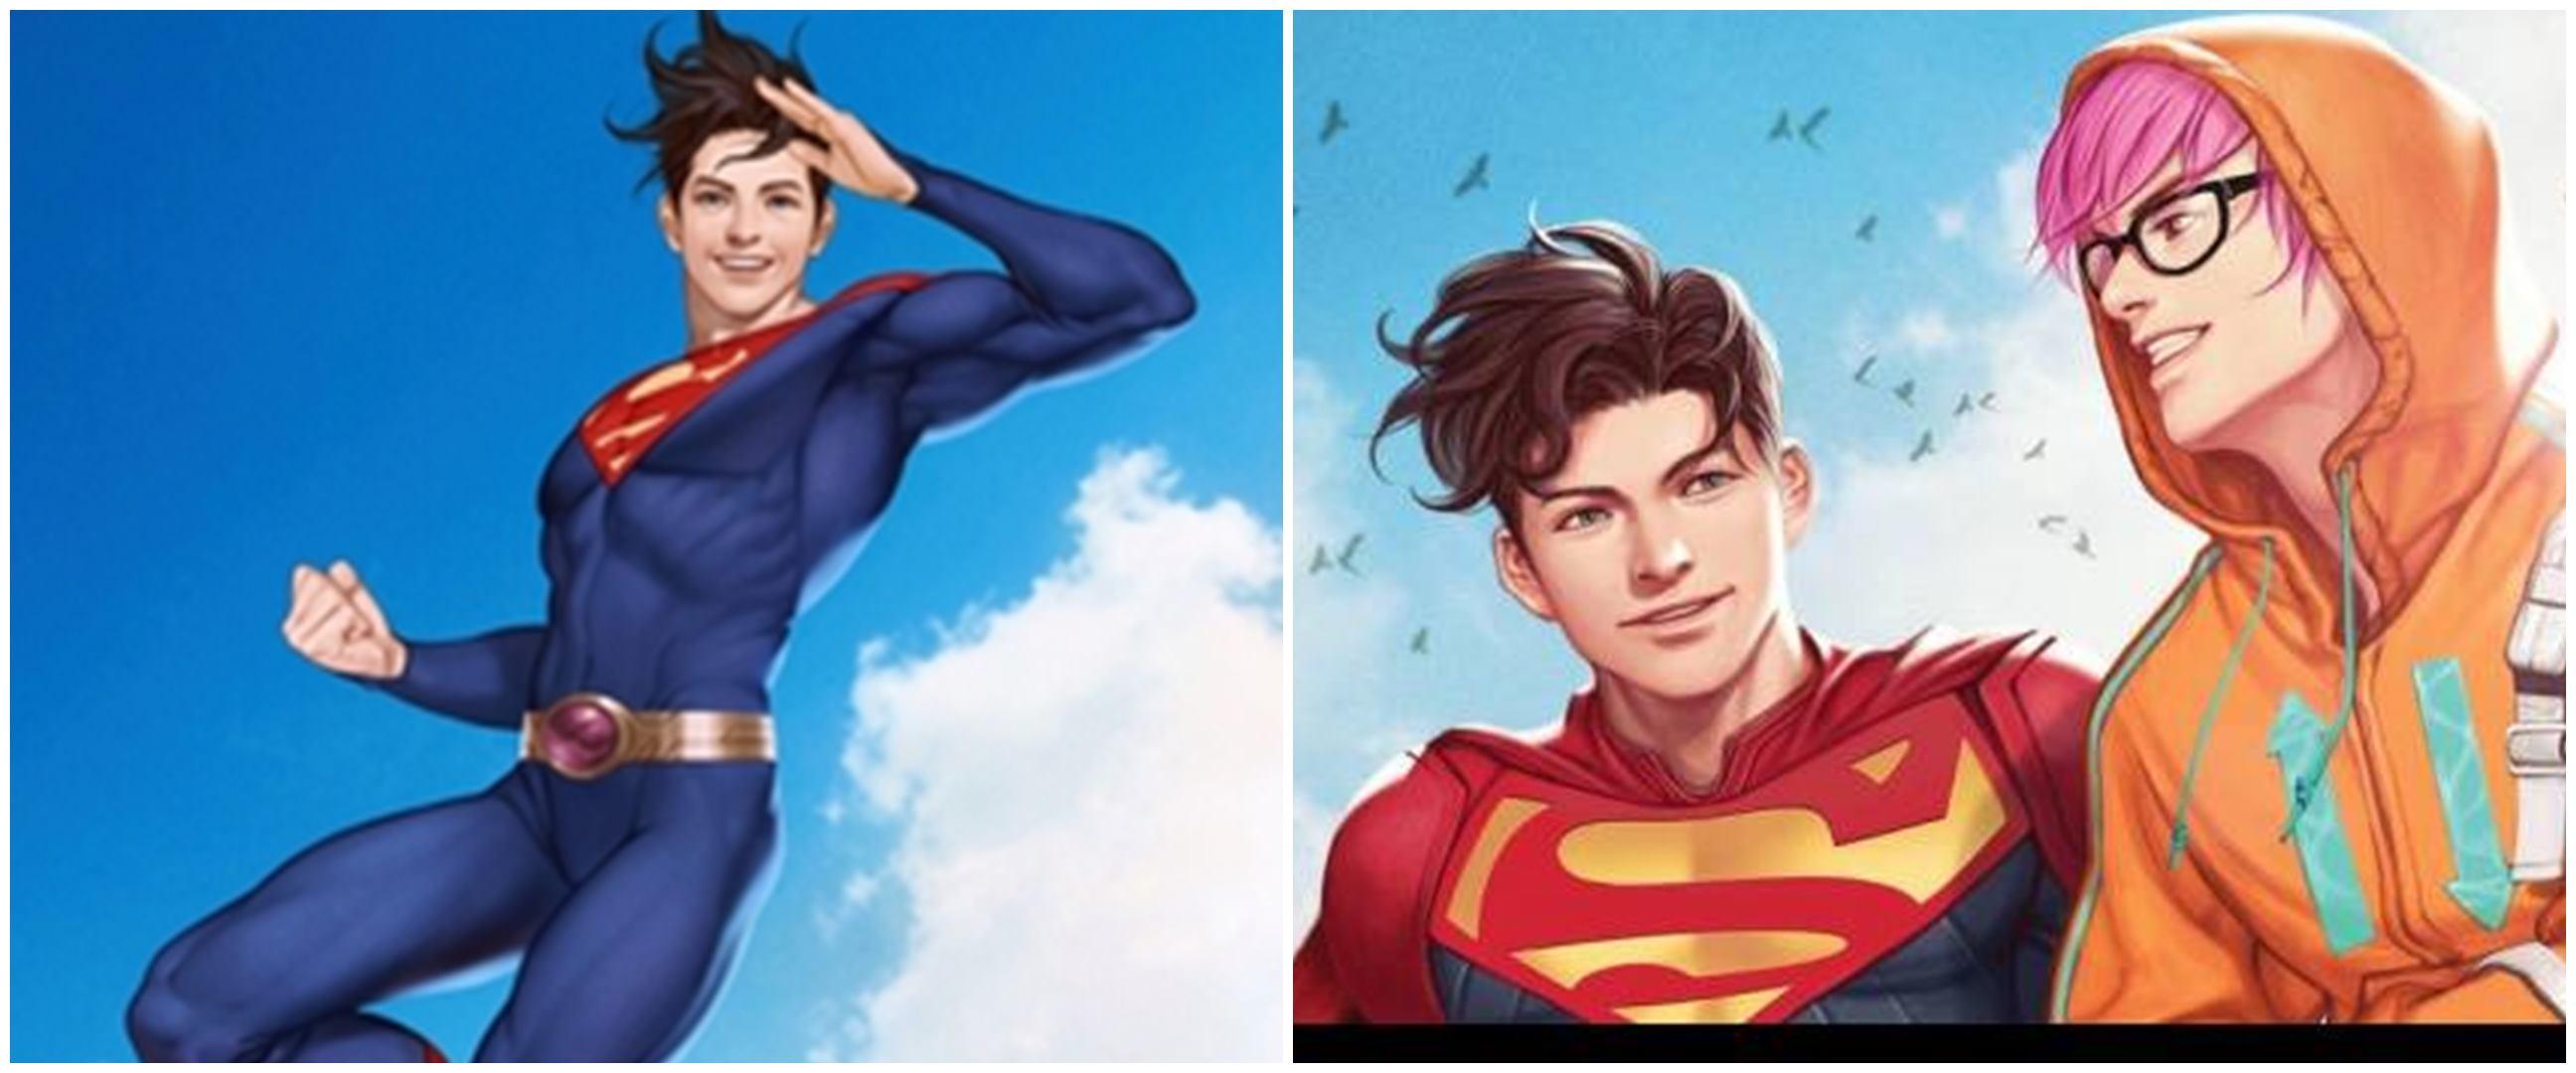 Orientasi seksual Superman rilis, politisi PPP minta pemerintah boikot